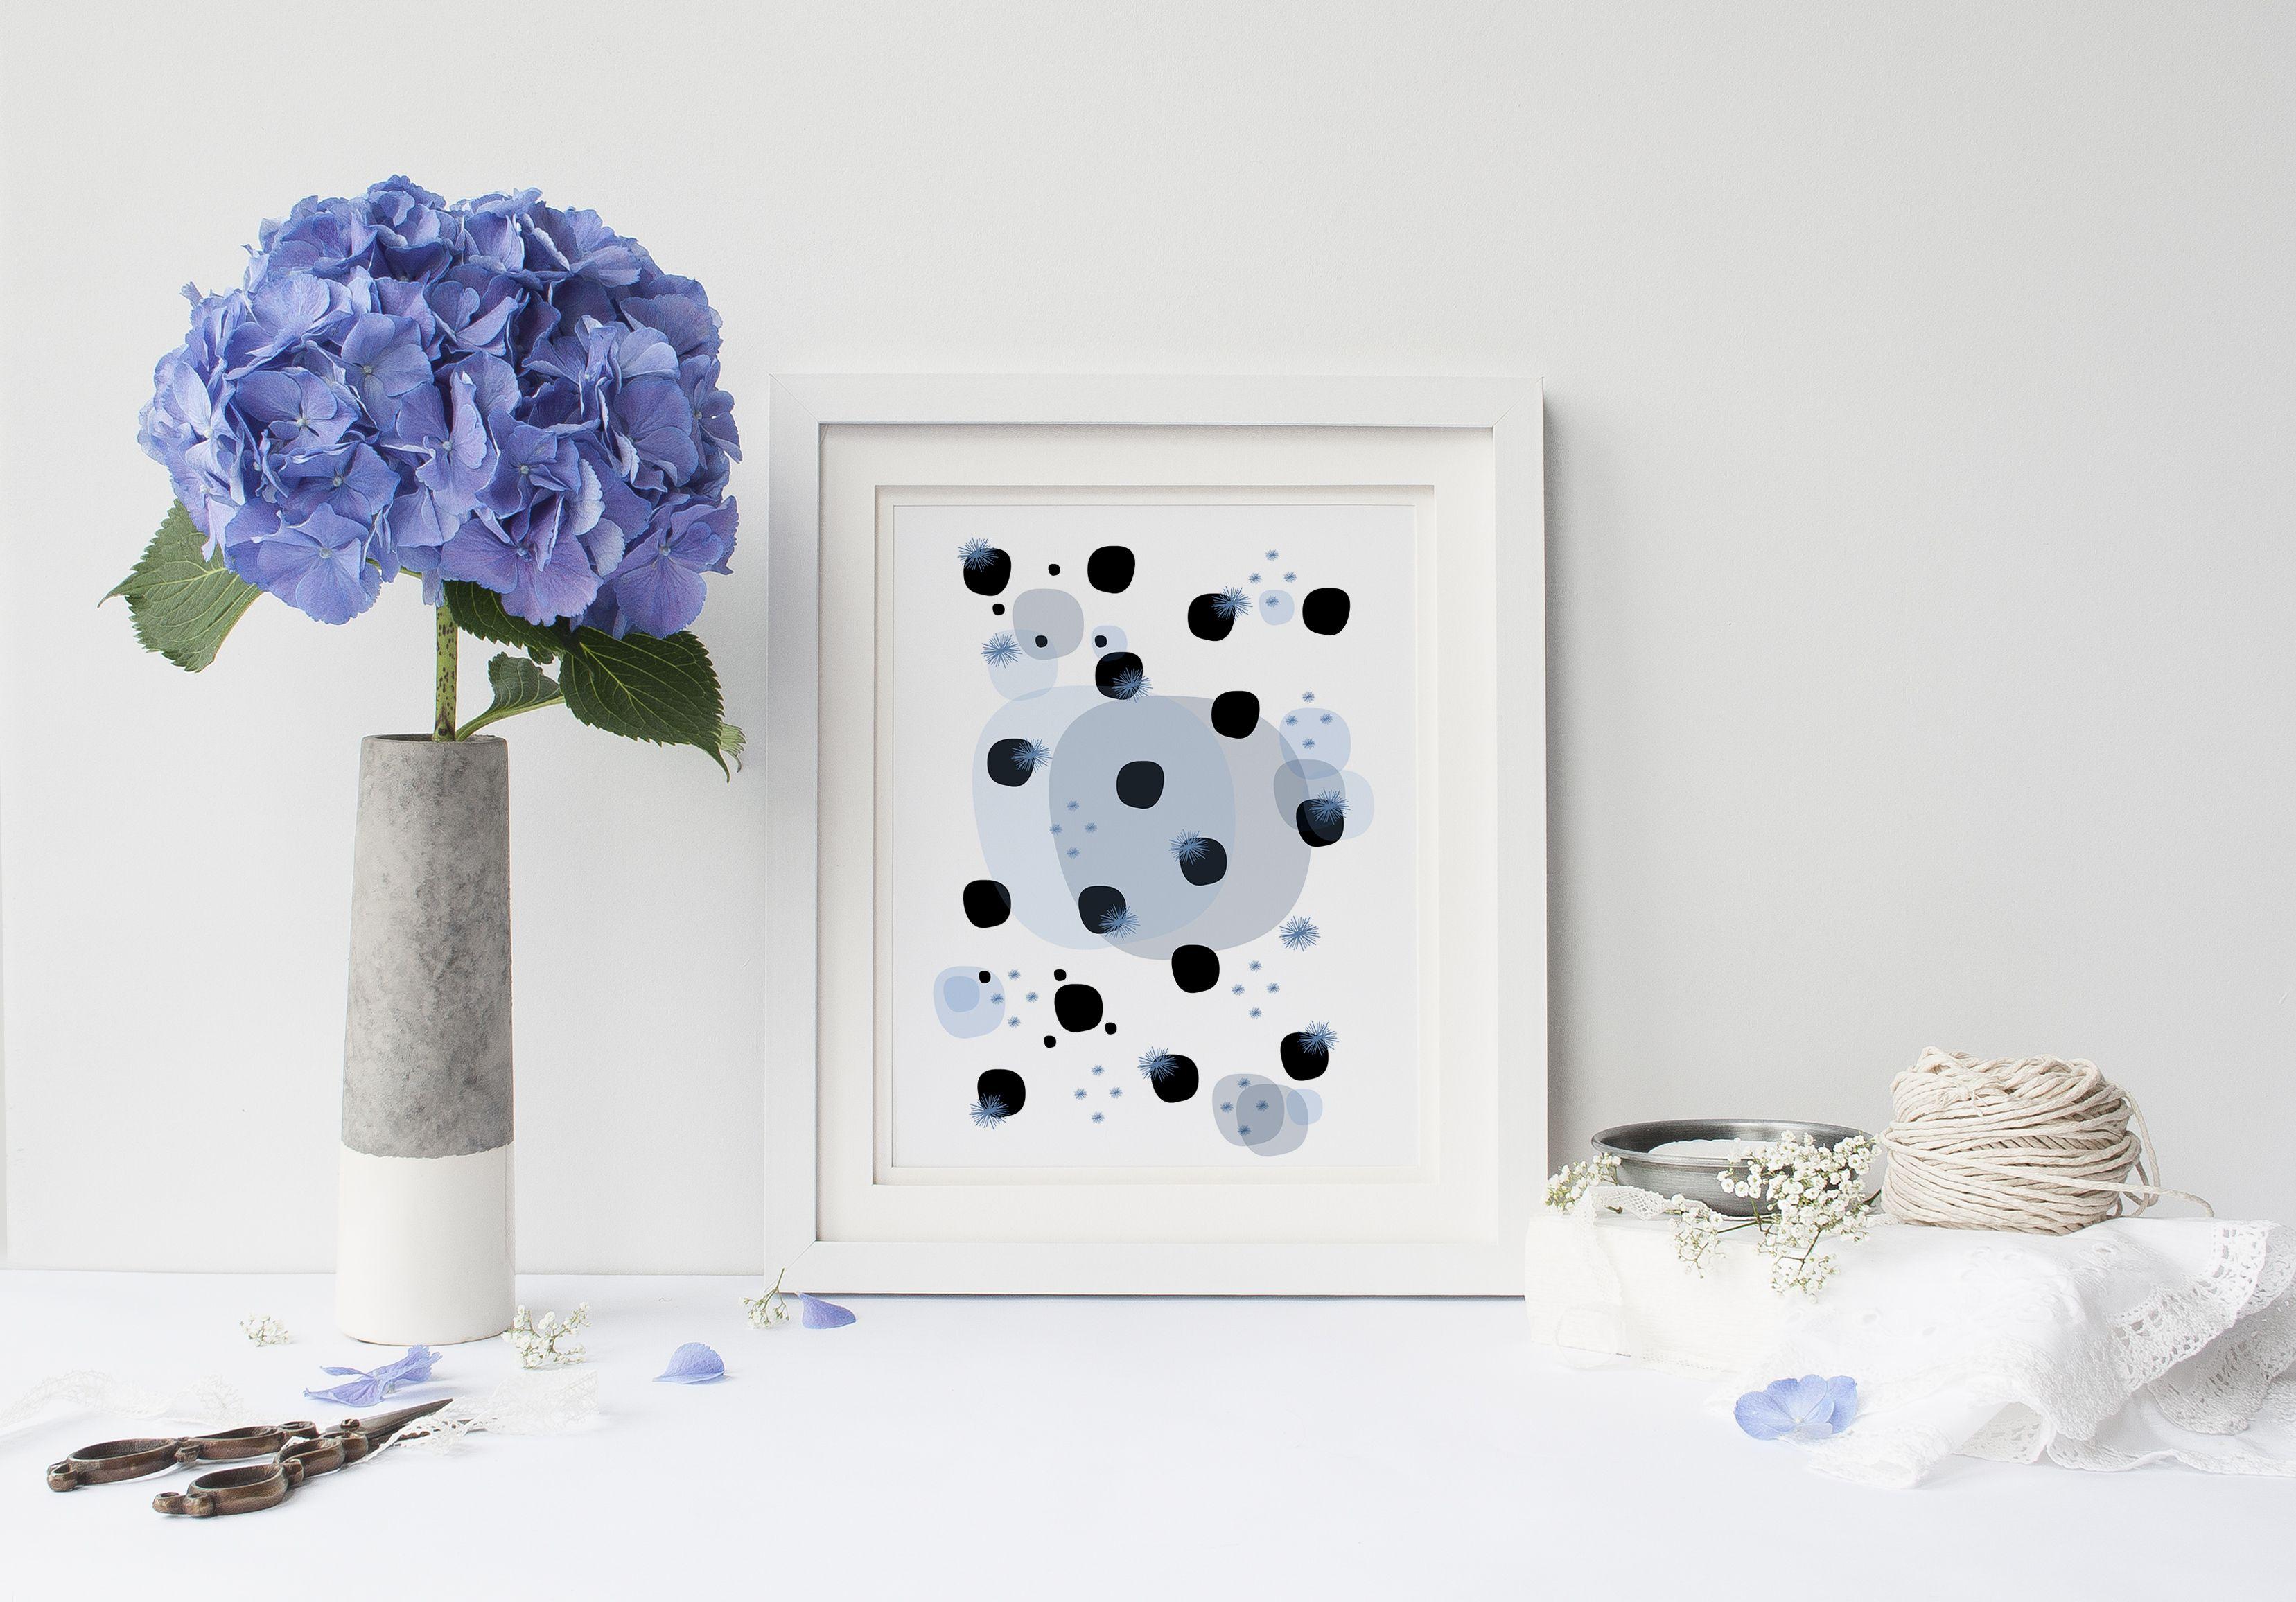 Lámina Asteroides de la colección Home. http://www.mimamhome.com/producto/lamina-pattern/